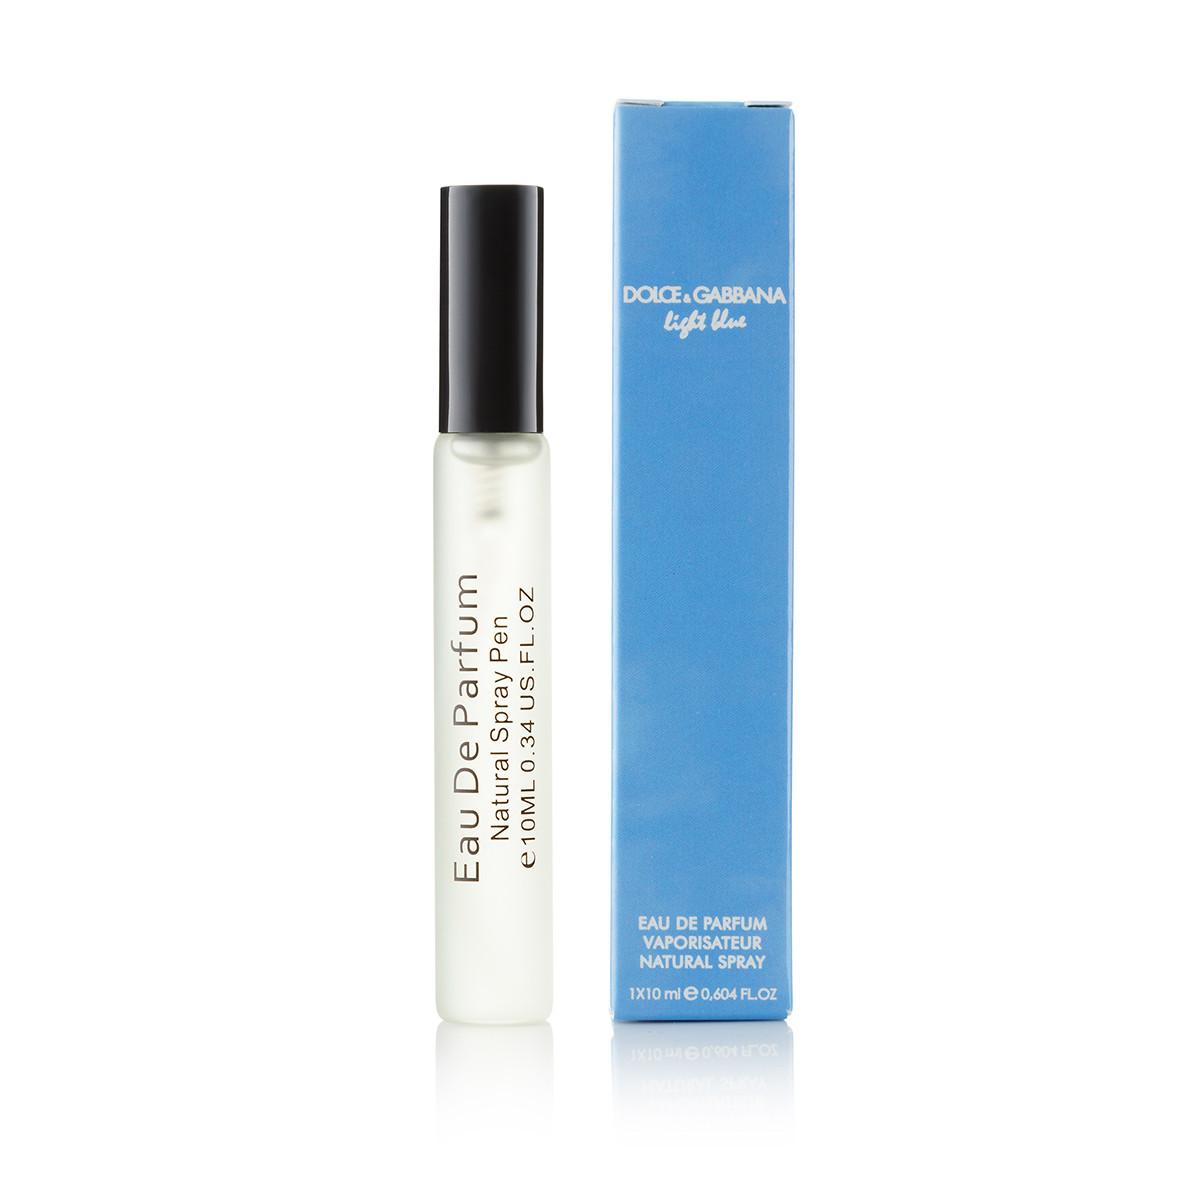 Женский мини парфюм спрей Dolce & Gabbana Light Blue - 10 мл Д-30